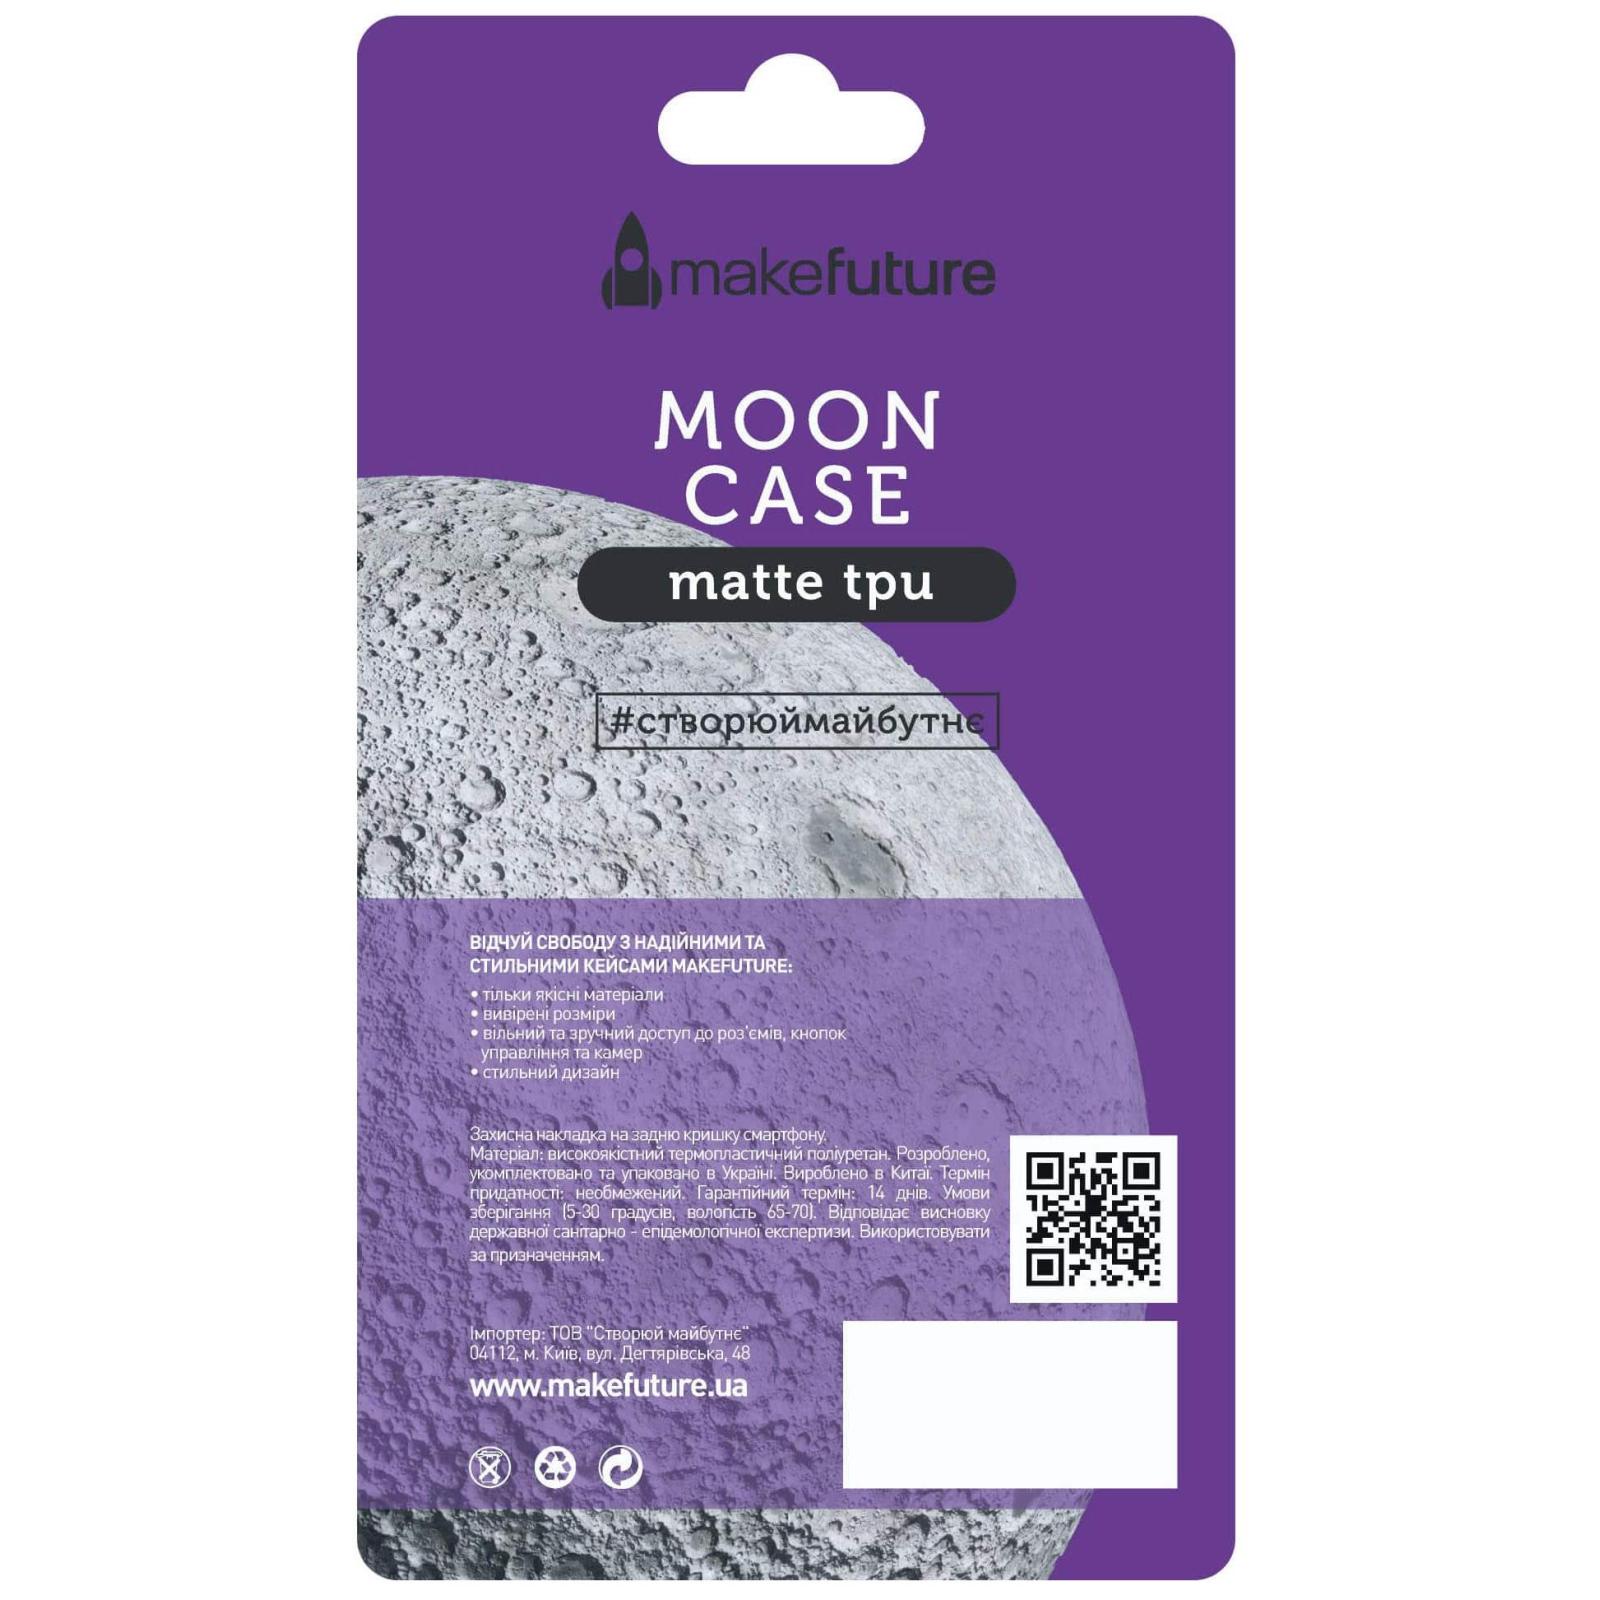 Чехол для моб. телефона MakeFuture Moon Case (TPU) для Huawei Mate 10 Lite Blue (MCM-HUM10LBL) изображение 5